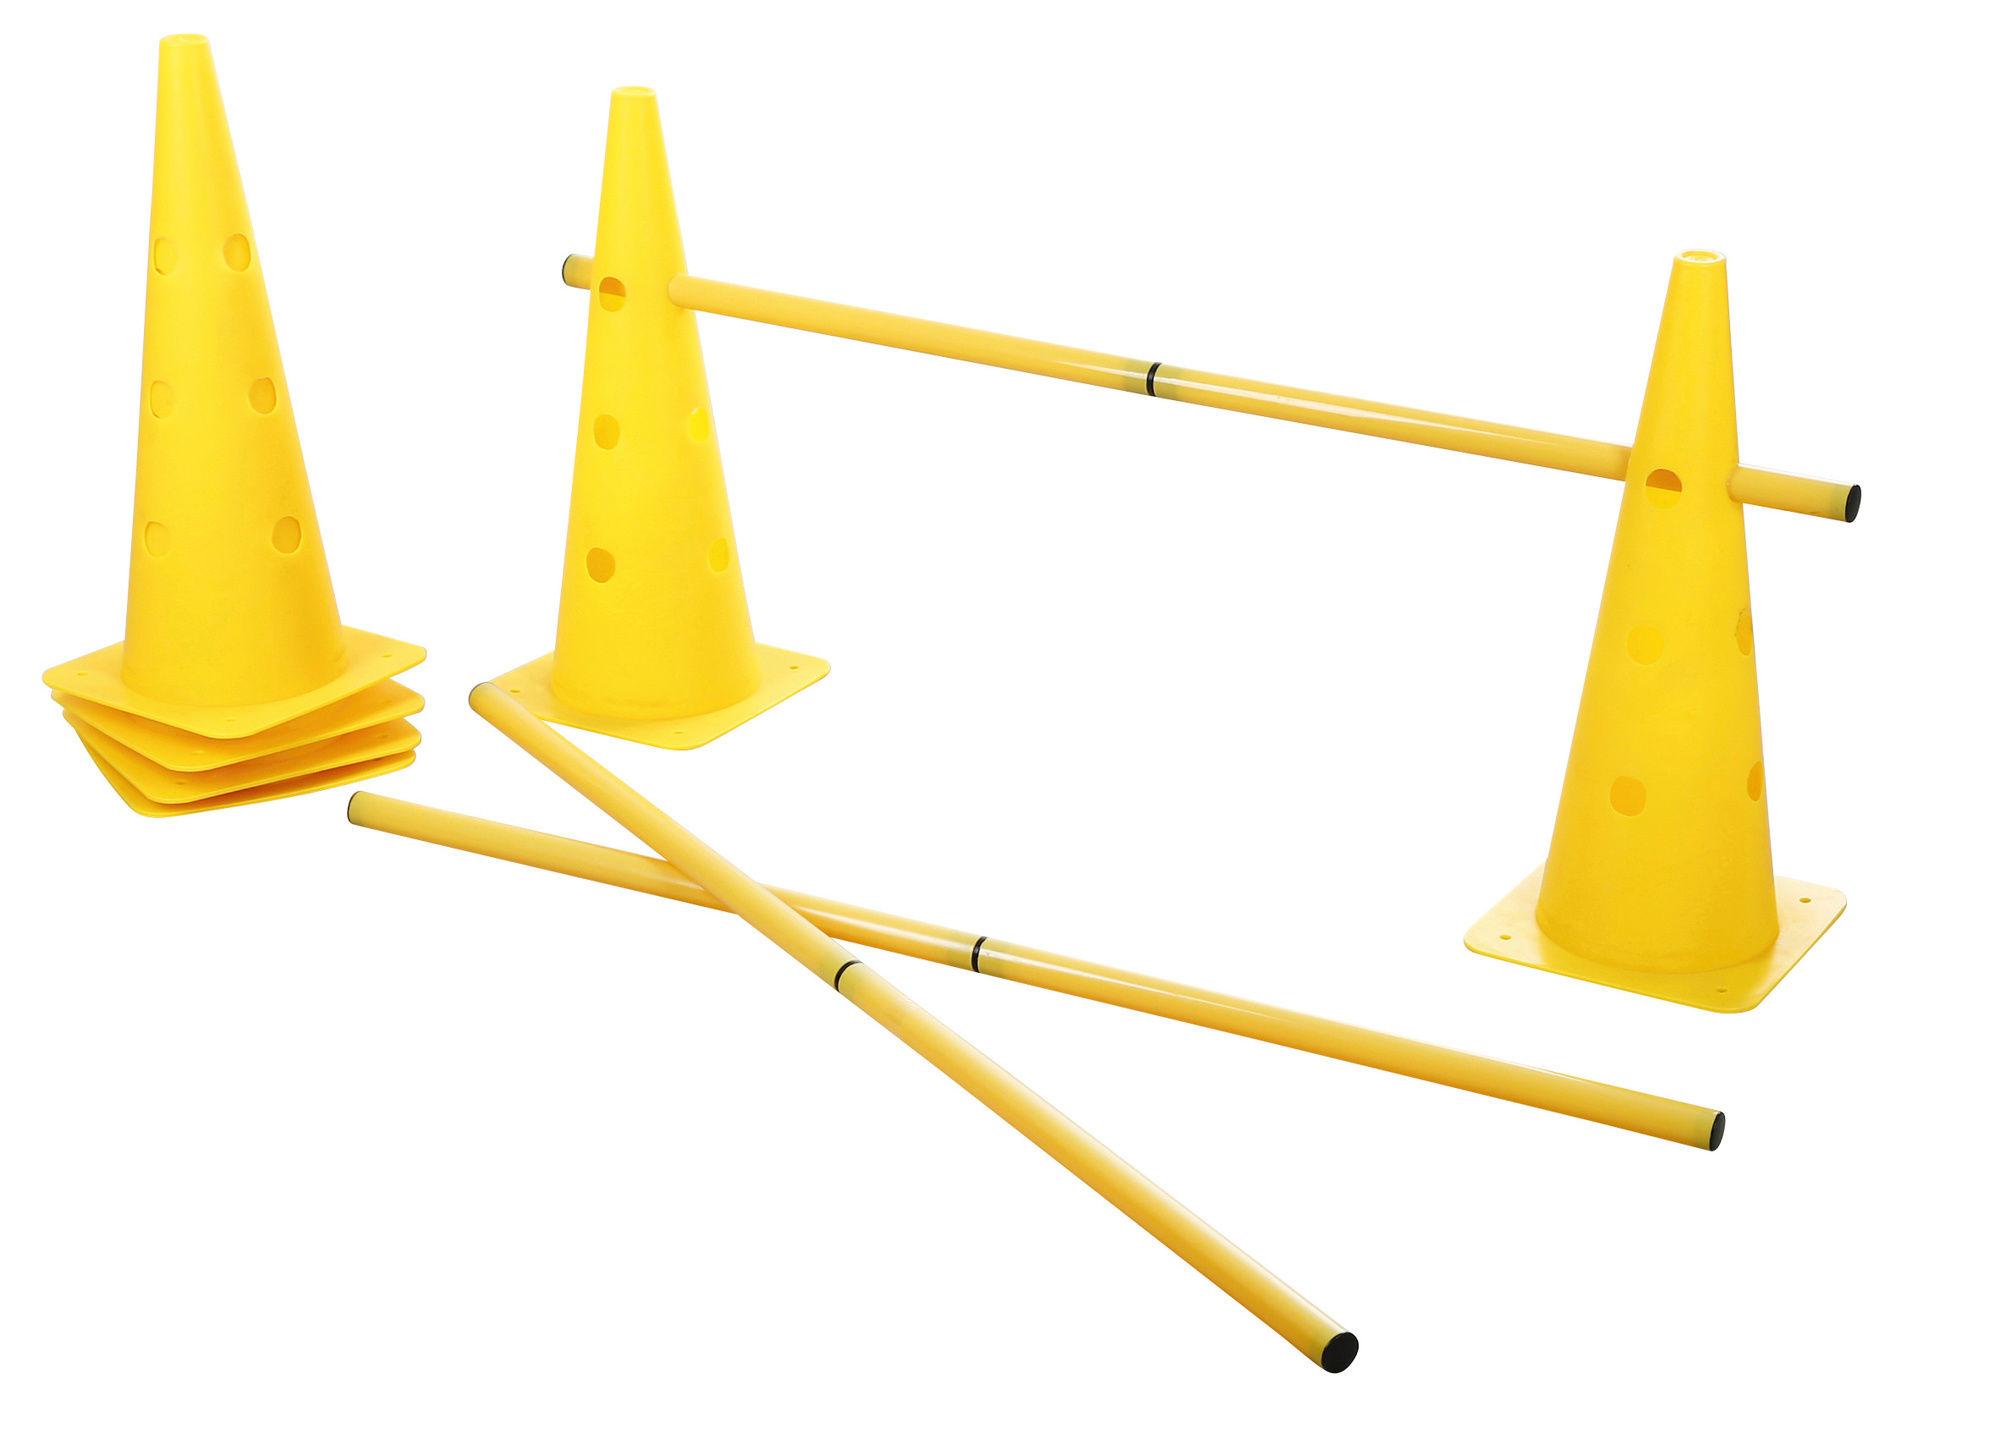 Agility Pylonen-Hürden Set, gelb, 3 Hürden